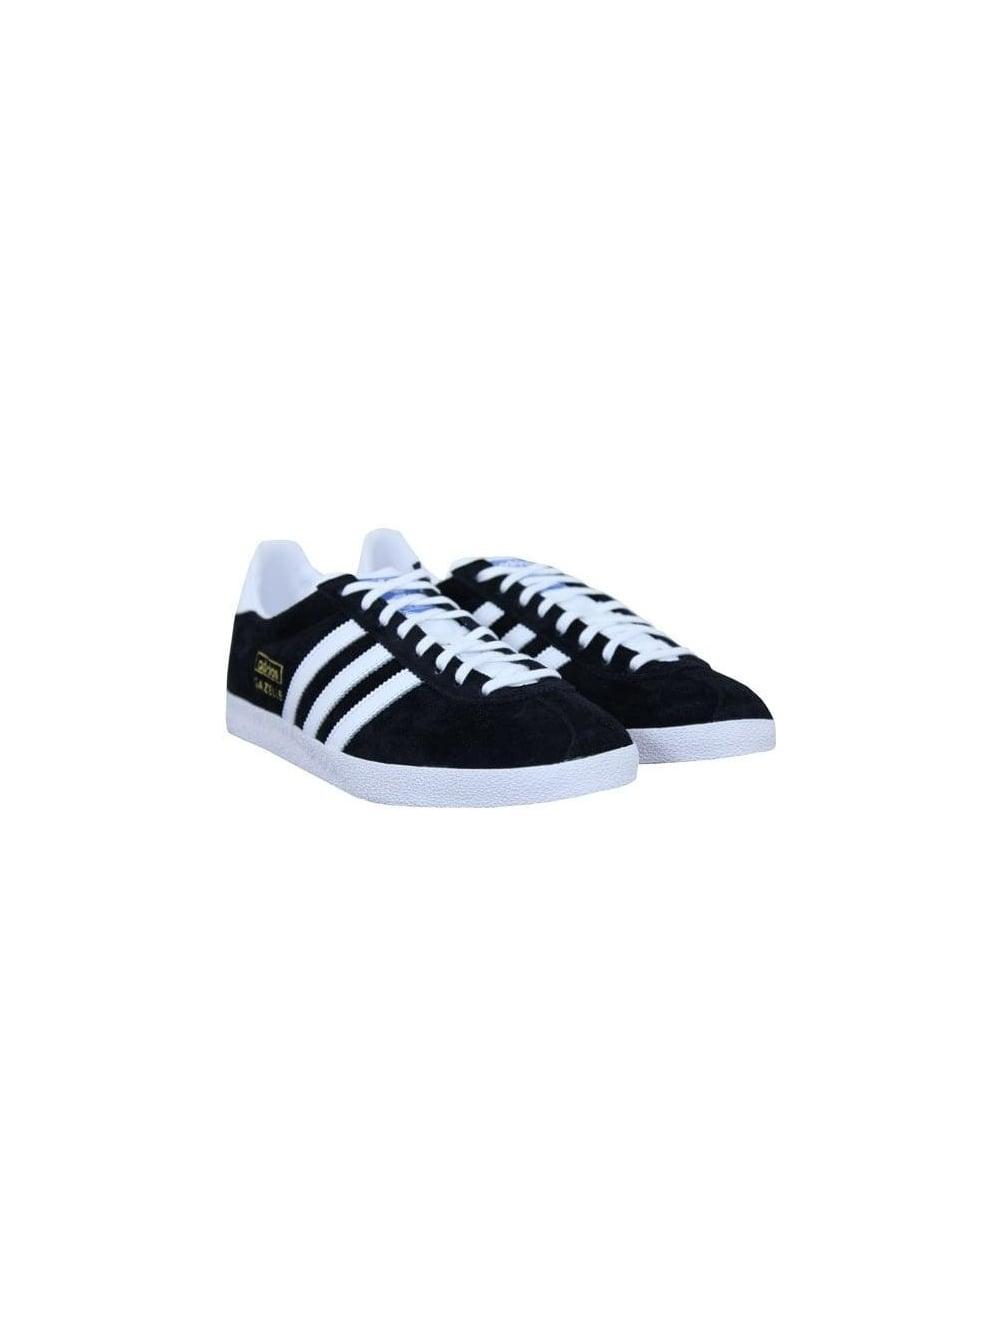 separation shoes 65f09 c0da8 Gazelle OG Trainers - Black White